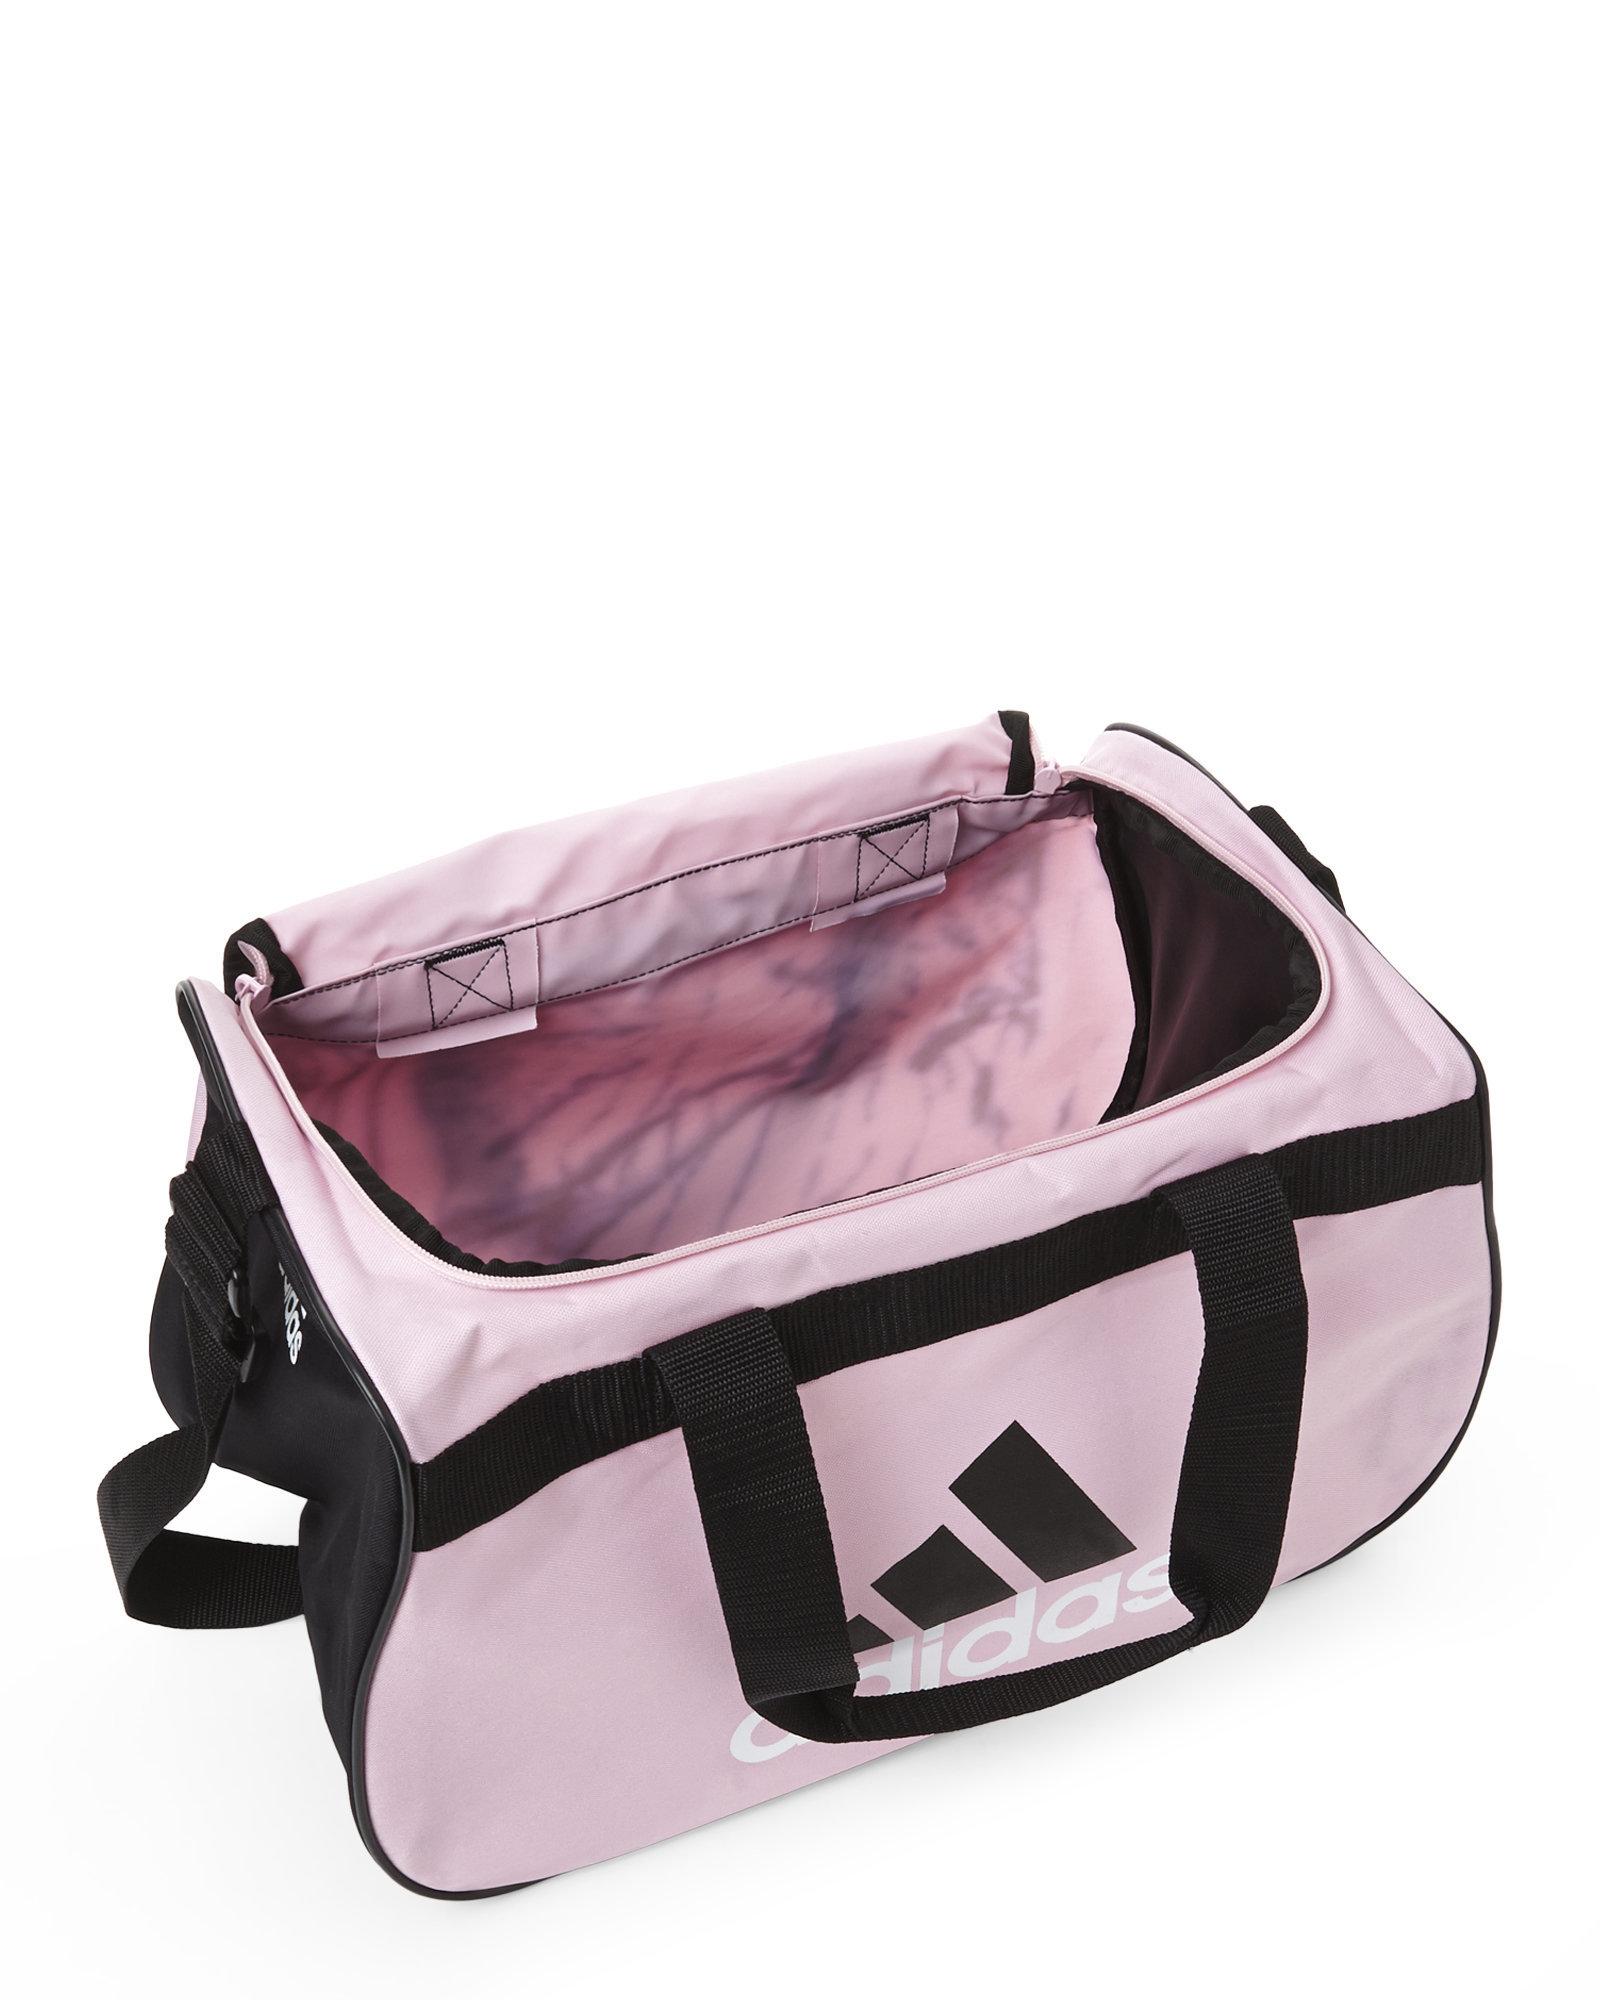 0d0bbb11f07e Lyst - adidas Originals Pink   Black Diablo Small Duffel in Pink